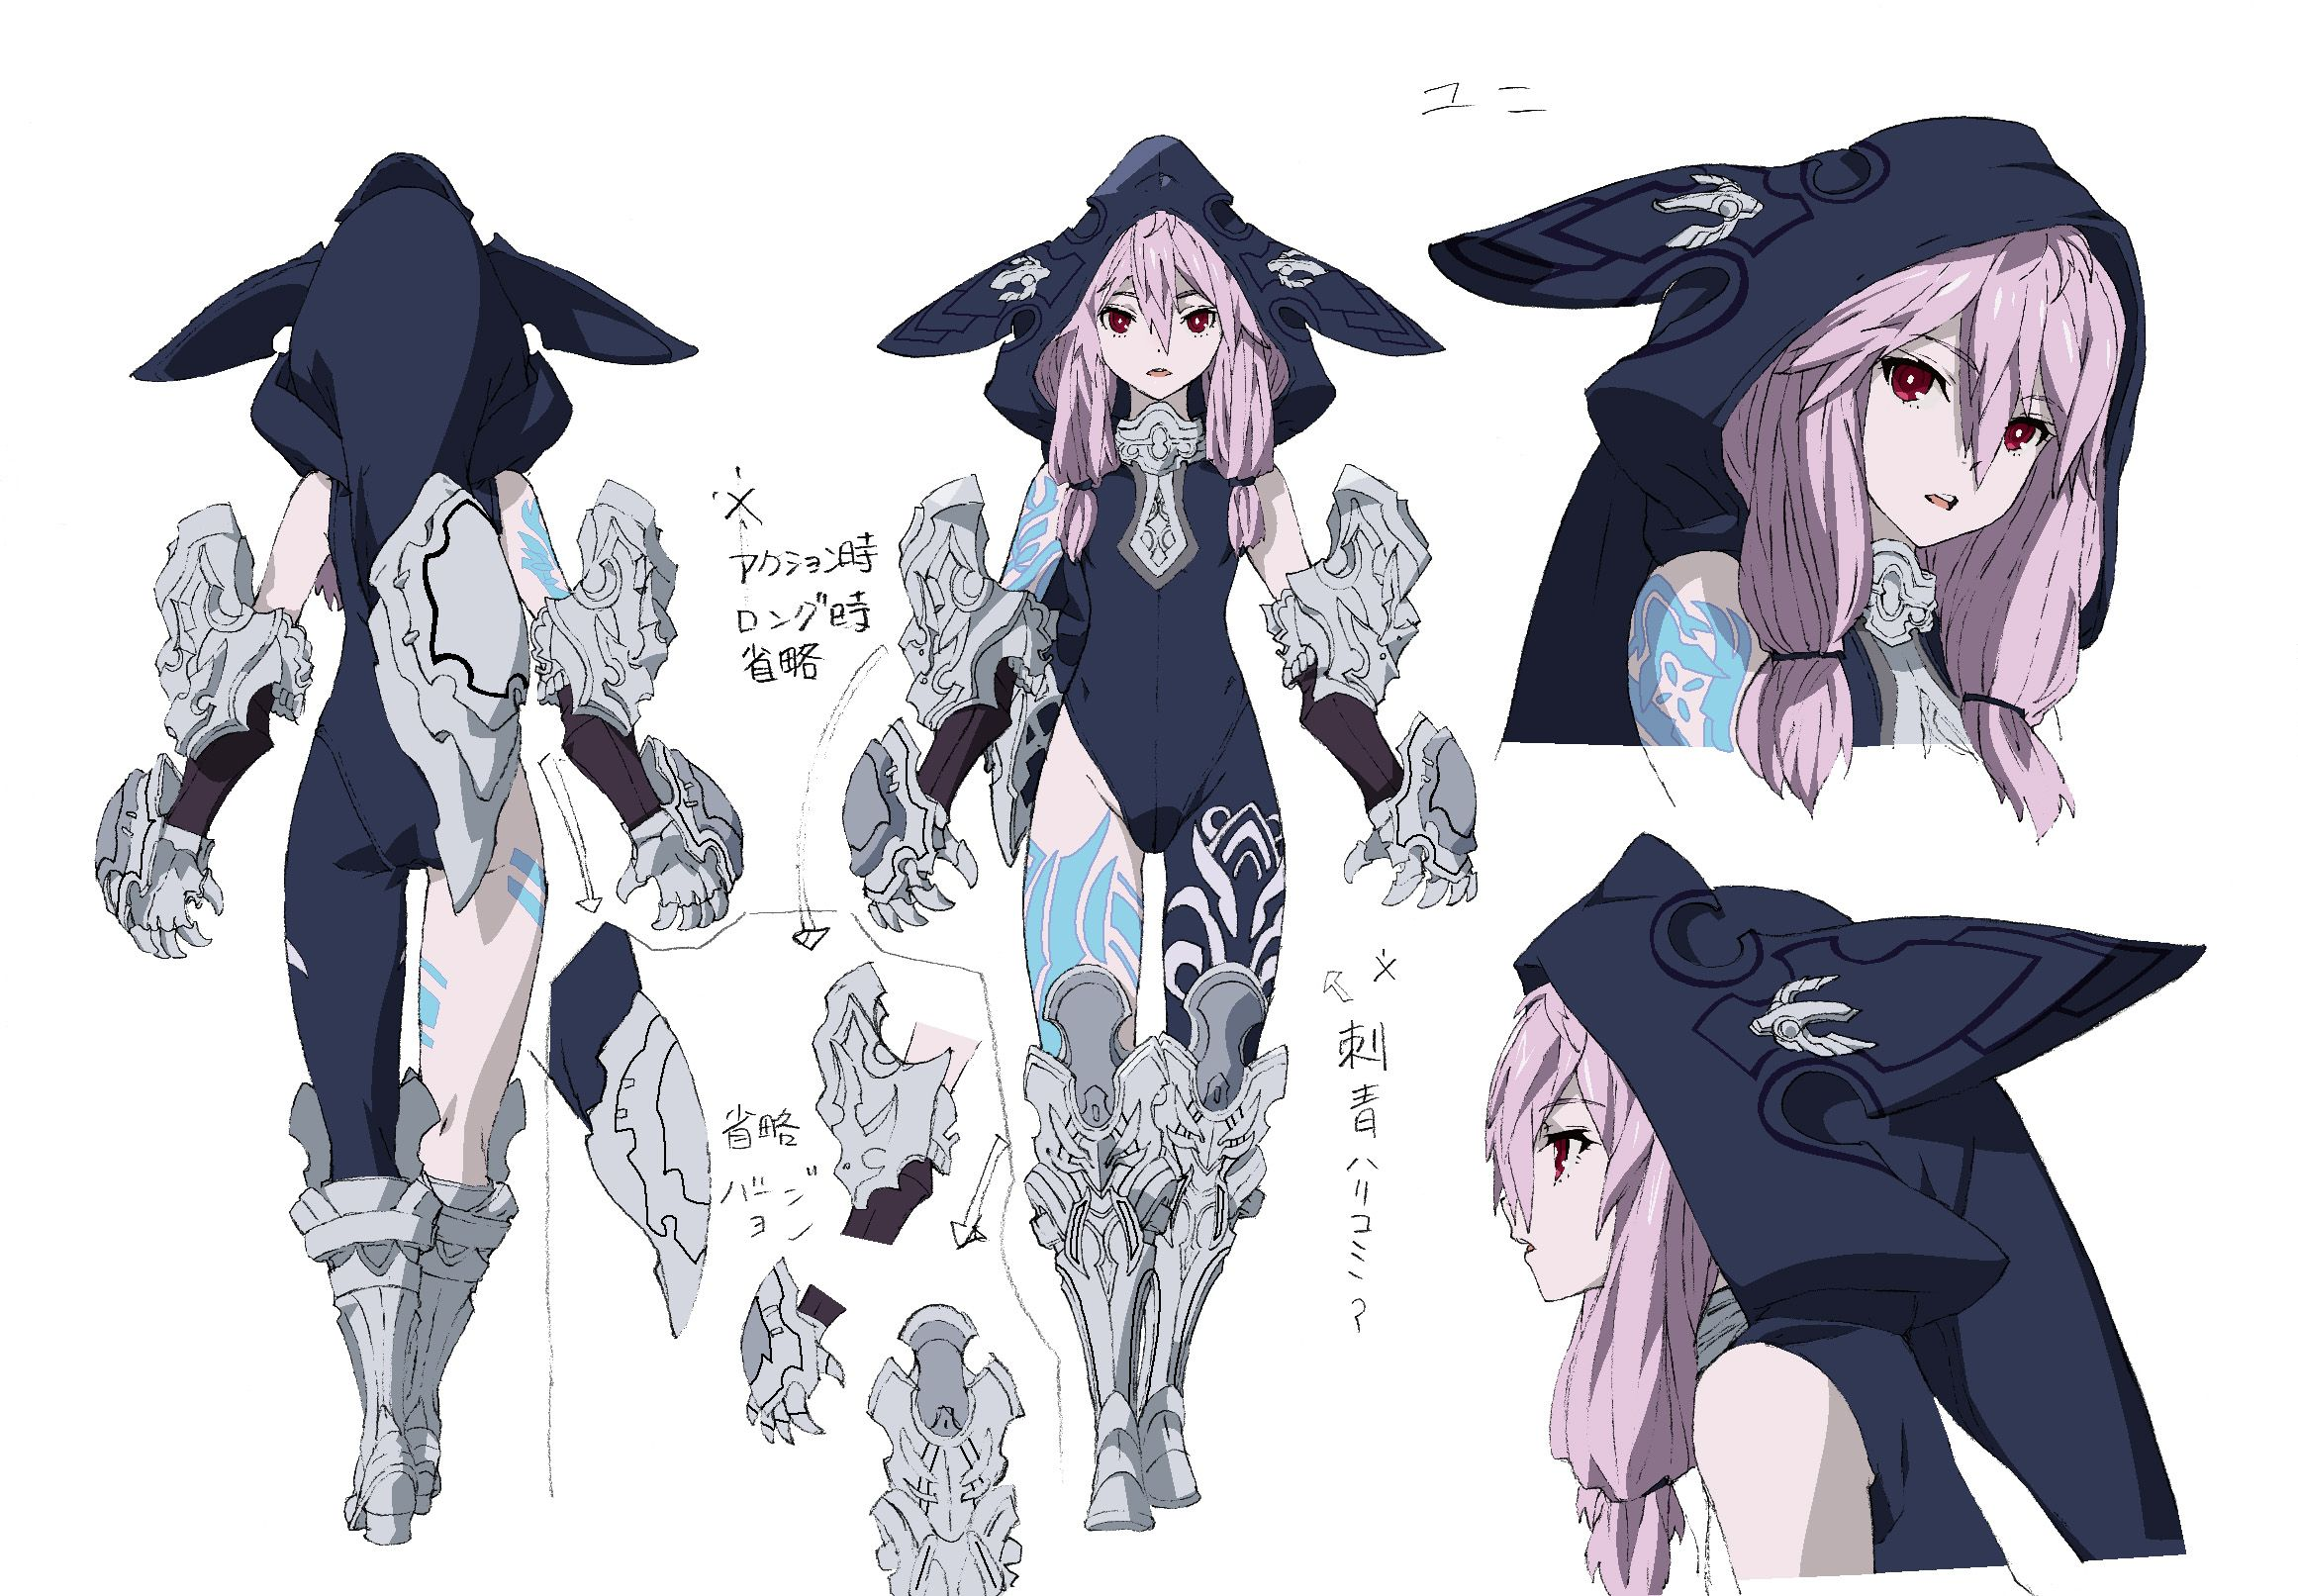 Yuni Chain Chronicle Ilustracoes Desenho De Personagens Arte Feminina